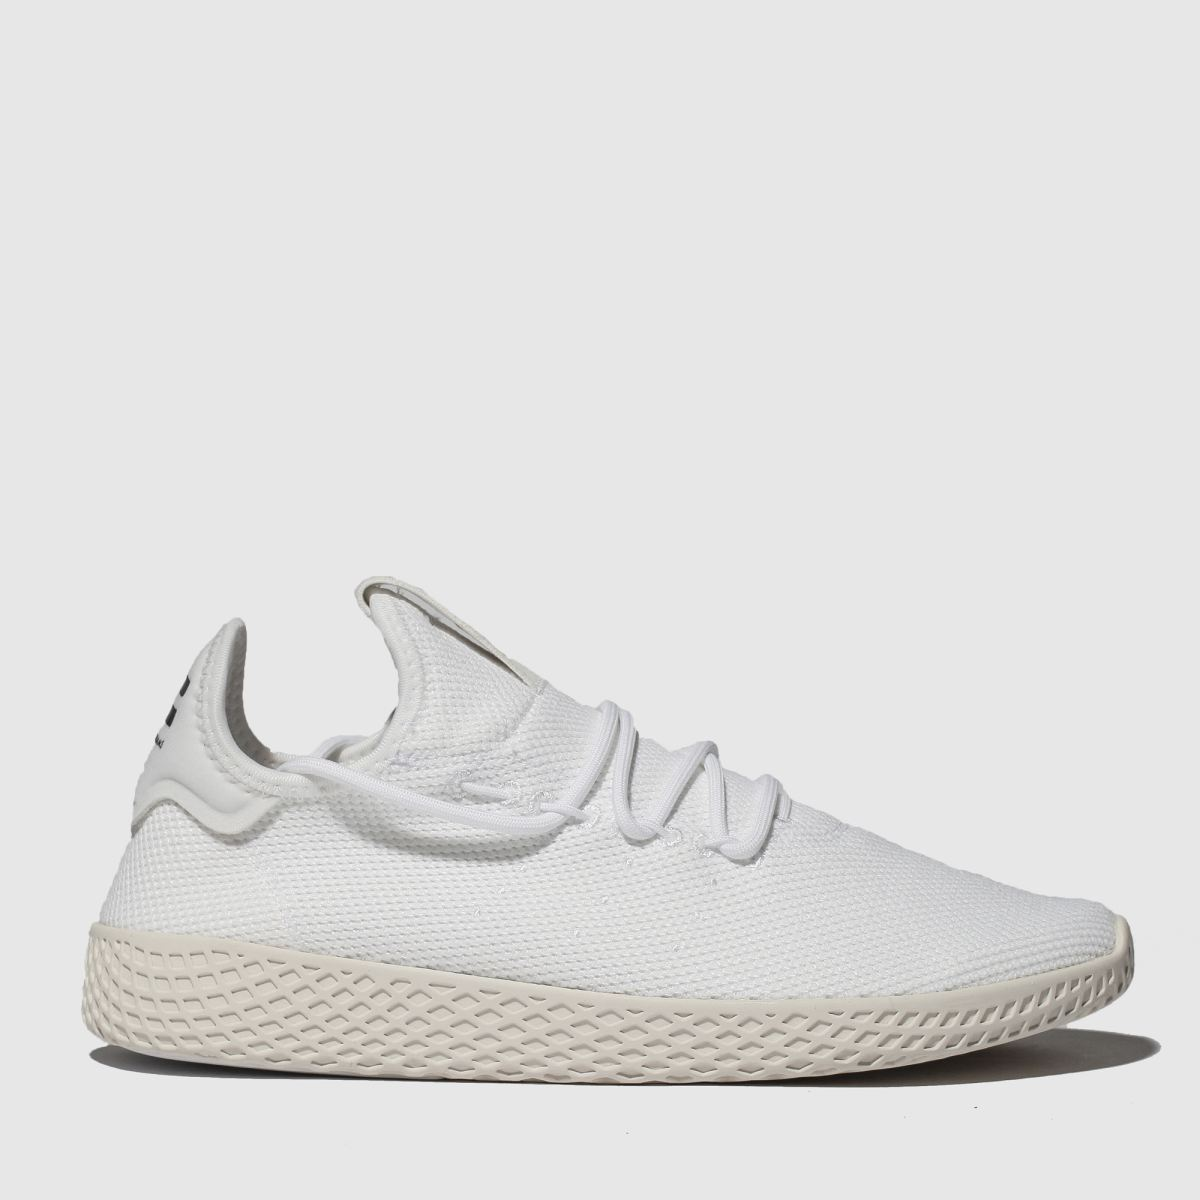 Adidas White & Beige Pharrell Williams Tennis Hu Trainers